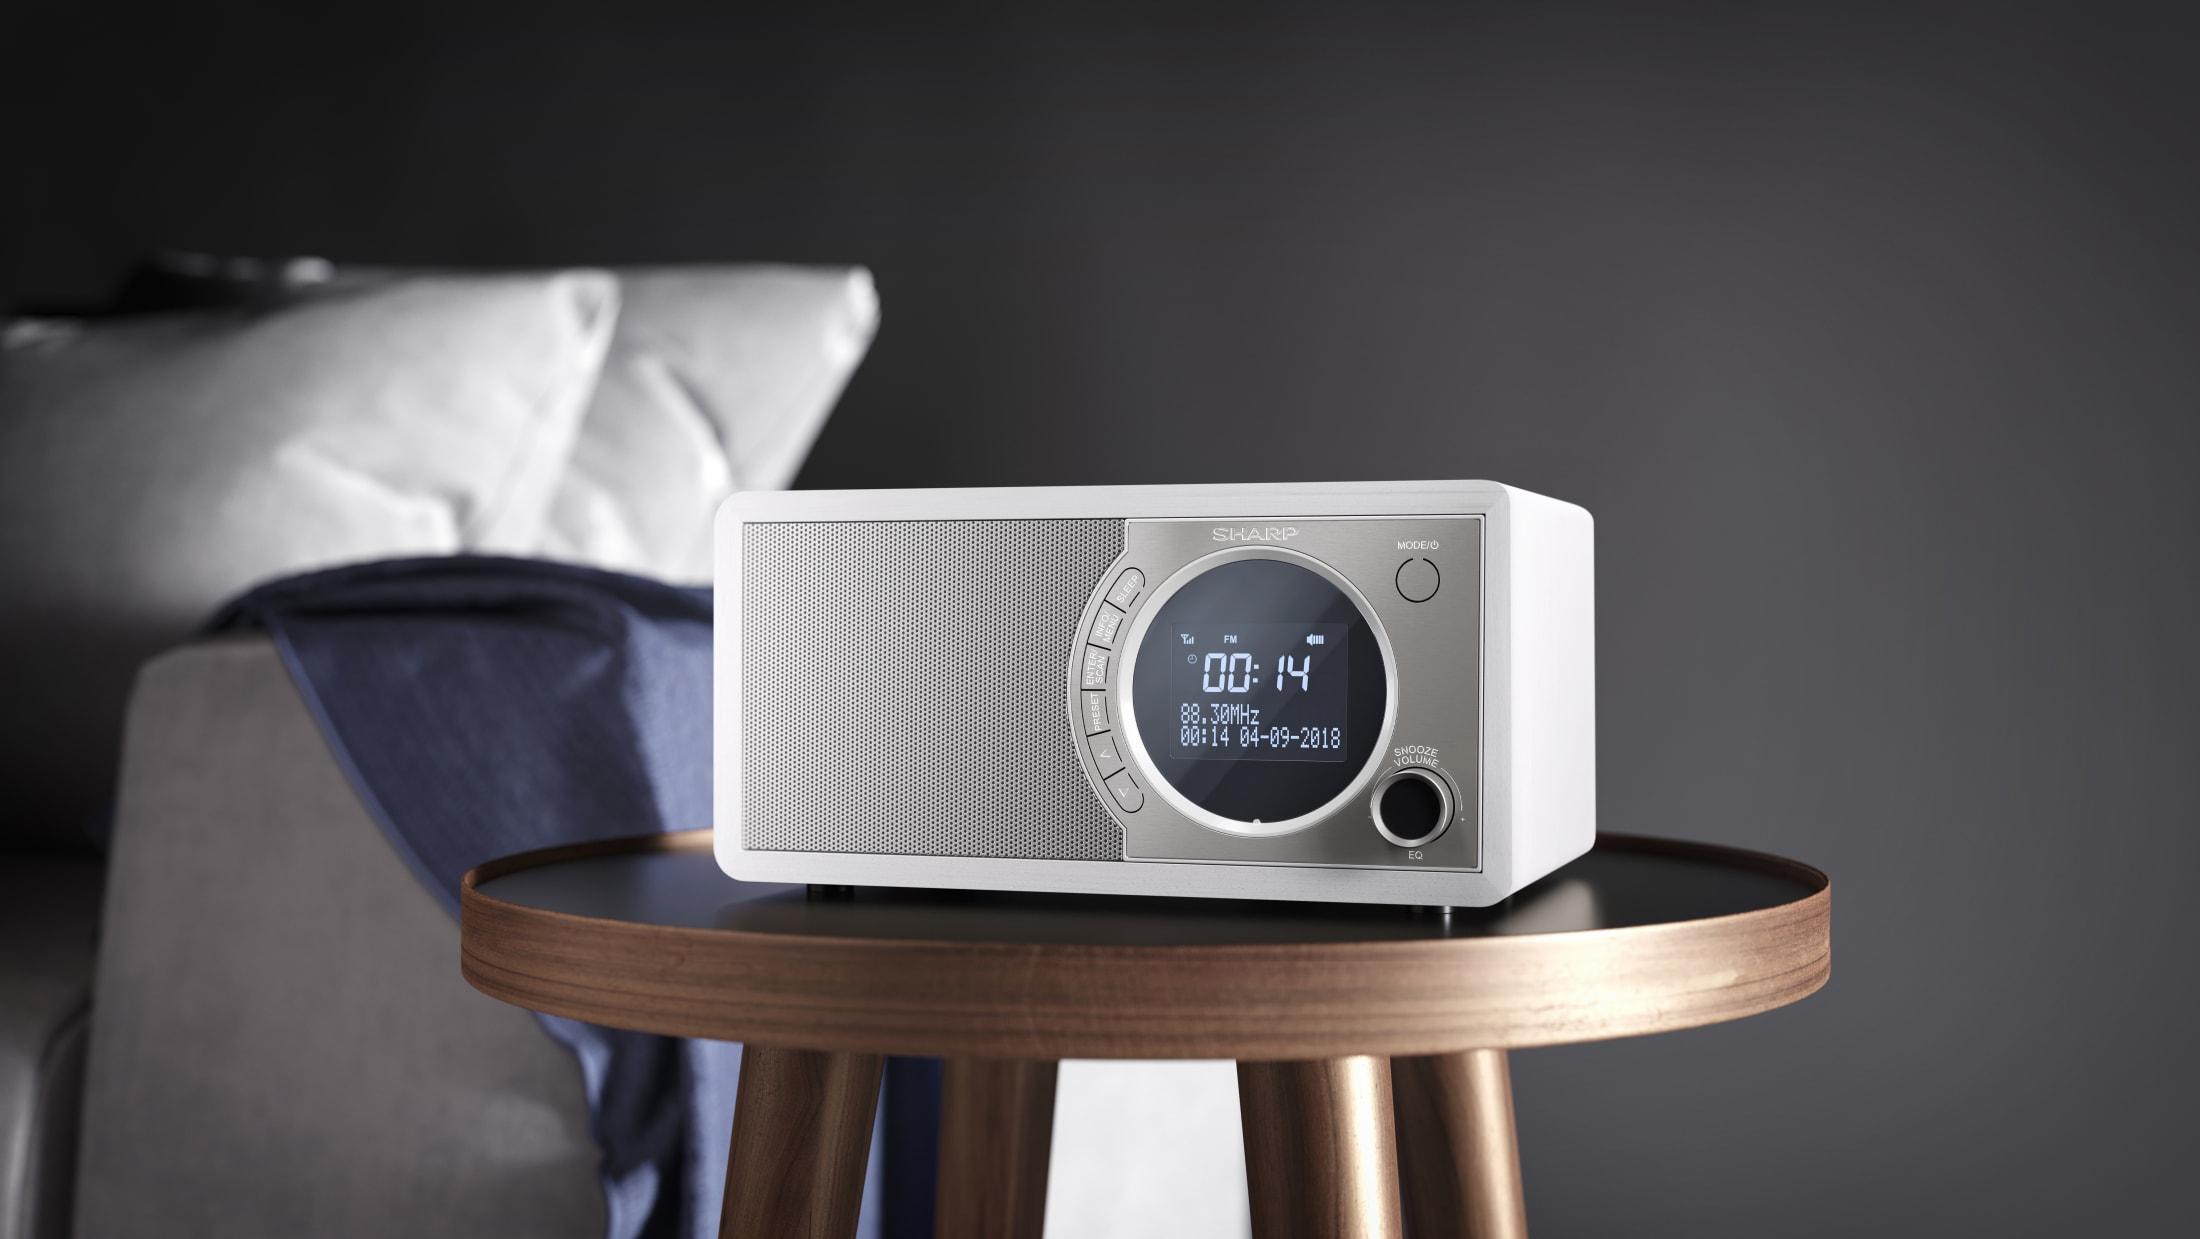 Digitalradio DAB/DAB+/FM with RDS, 6 W, Bluetooth 4.2 and 60 station memory.